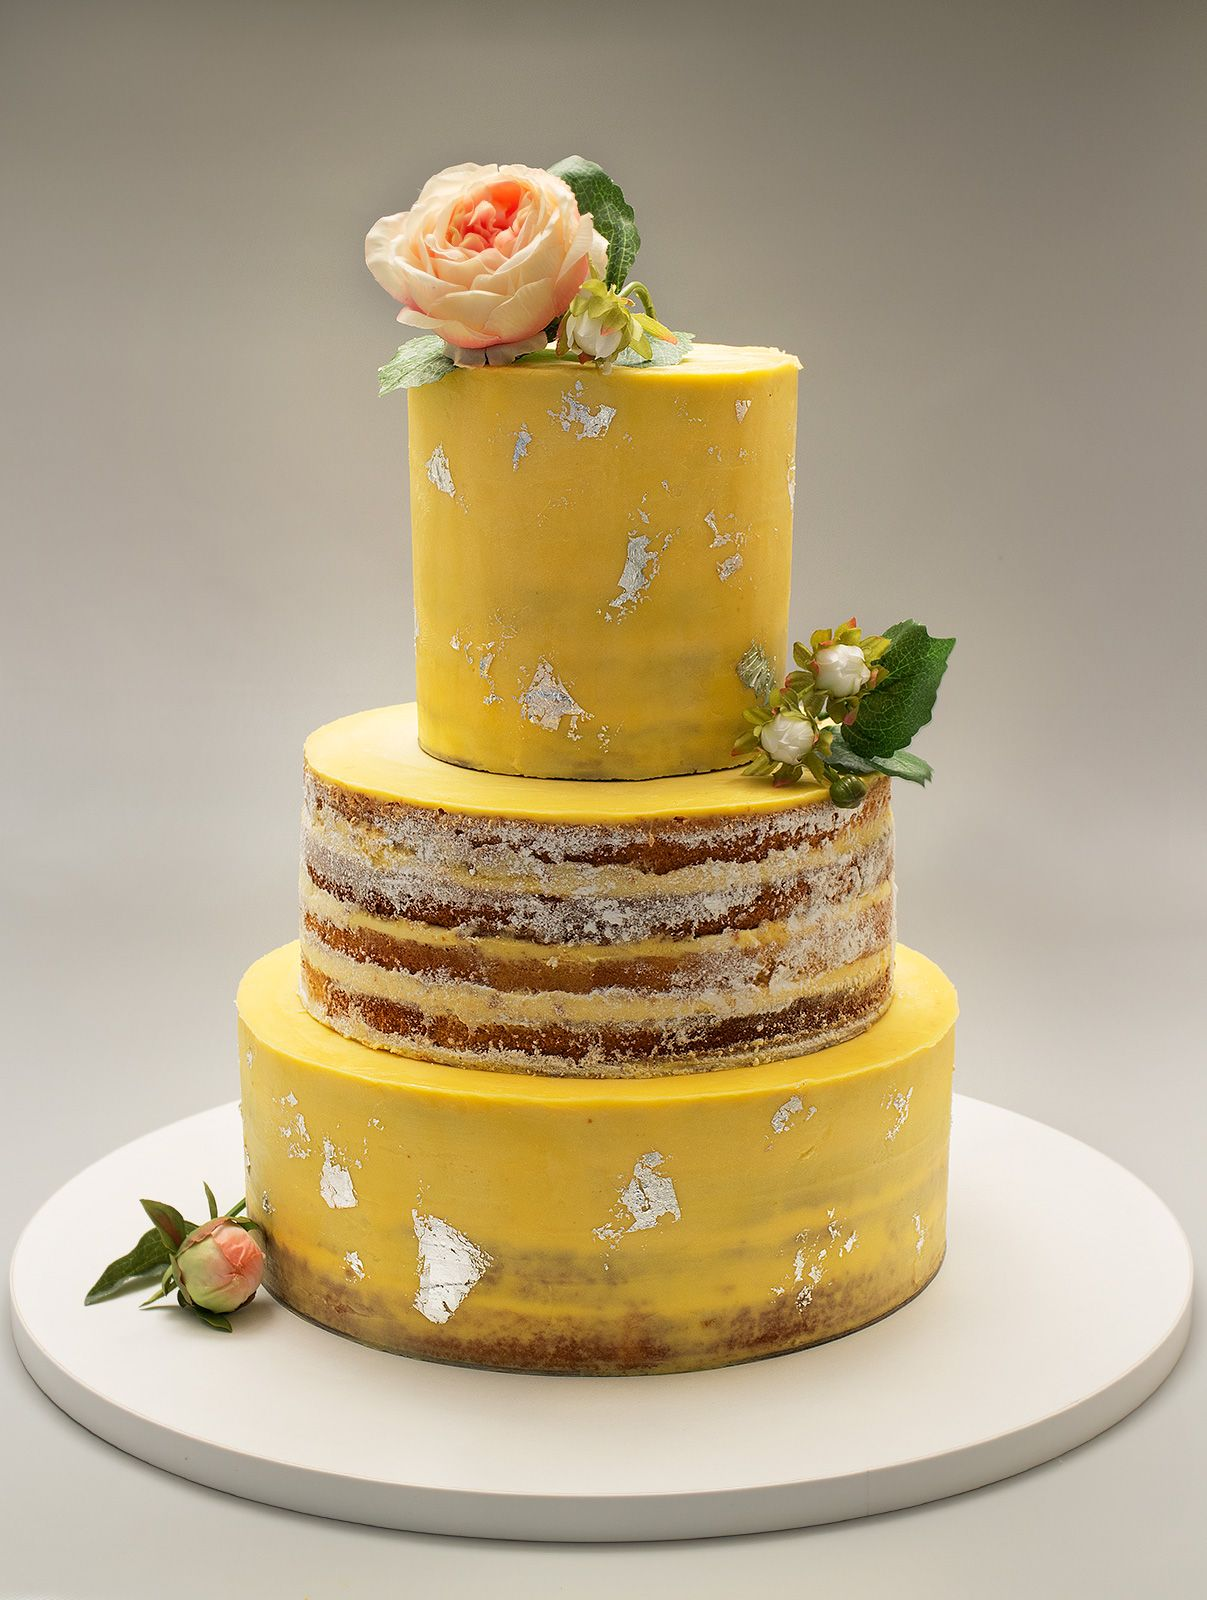 Pin by Tereza Alabanda on My wedding cakes | Pinterest | Wedding ...